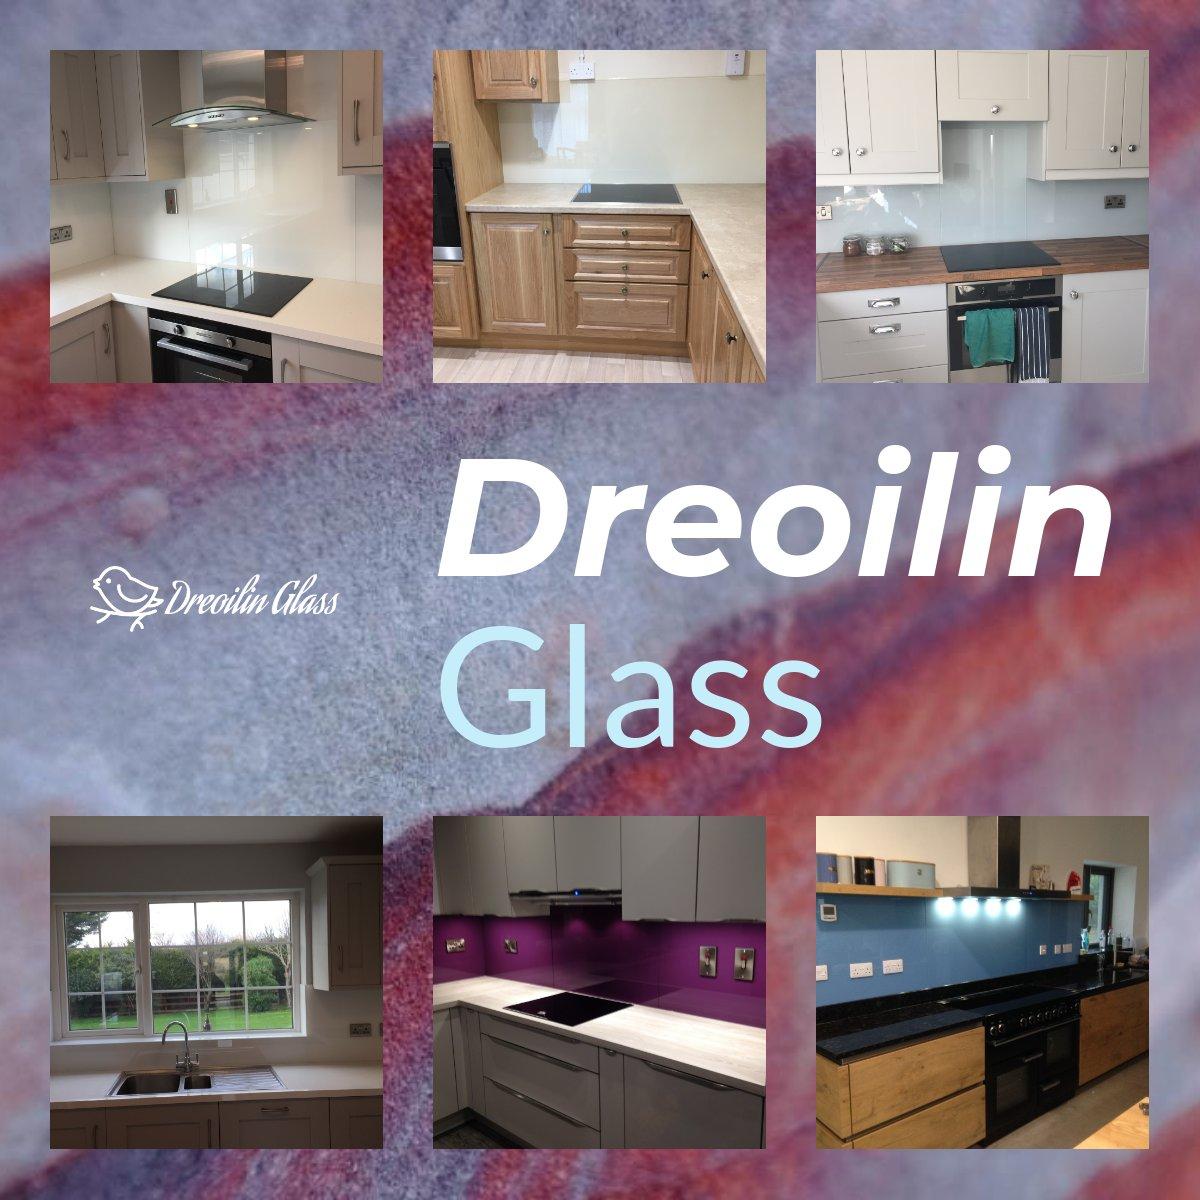 Share Moments. Share Dreoilin Glass  #waterford #dungarvan #glass #splashbacks #decorative #decoration #instadesign #interior4all #interior2you #interiorandhome #exclusivedesign #contemporarydesign #clonmel #homeimprovments #cork #kilkenny #balustrades